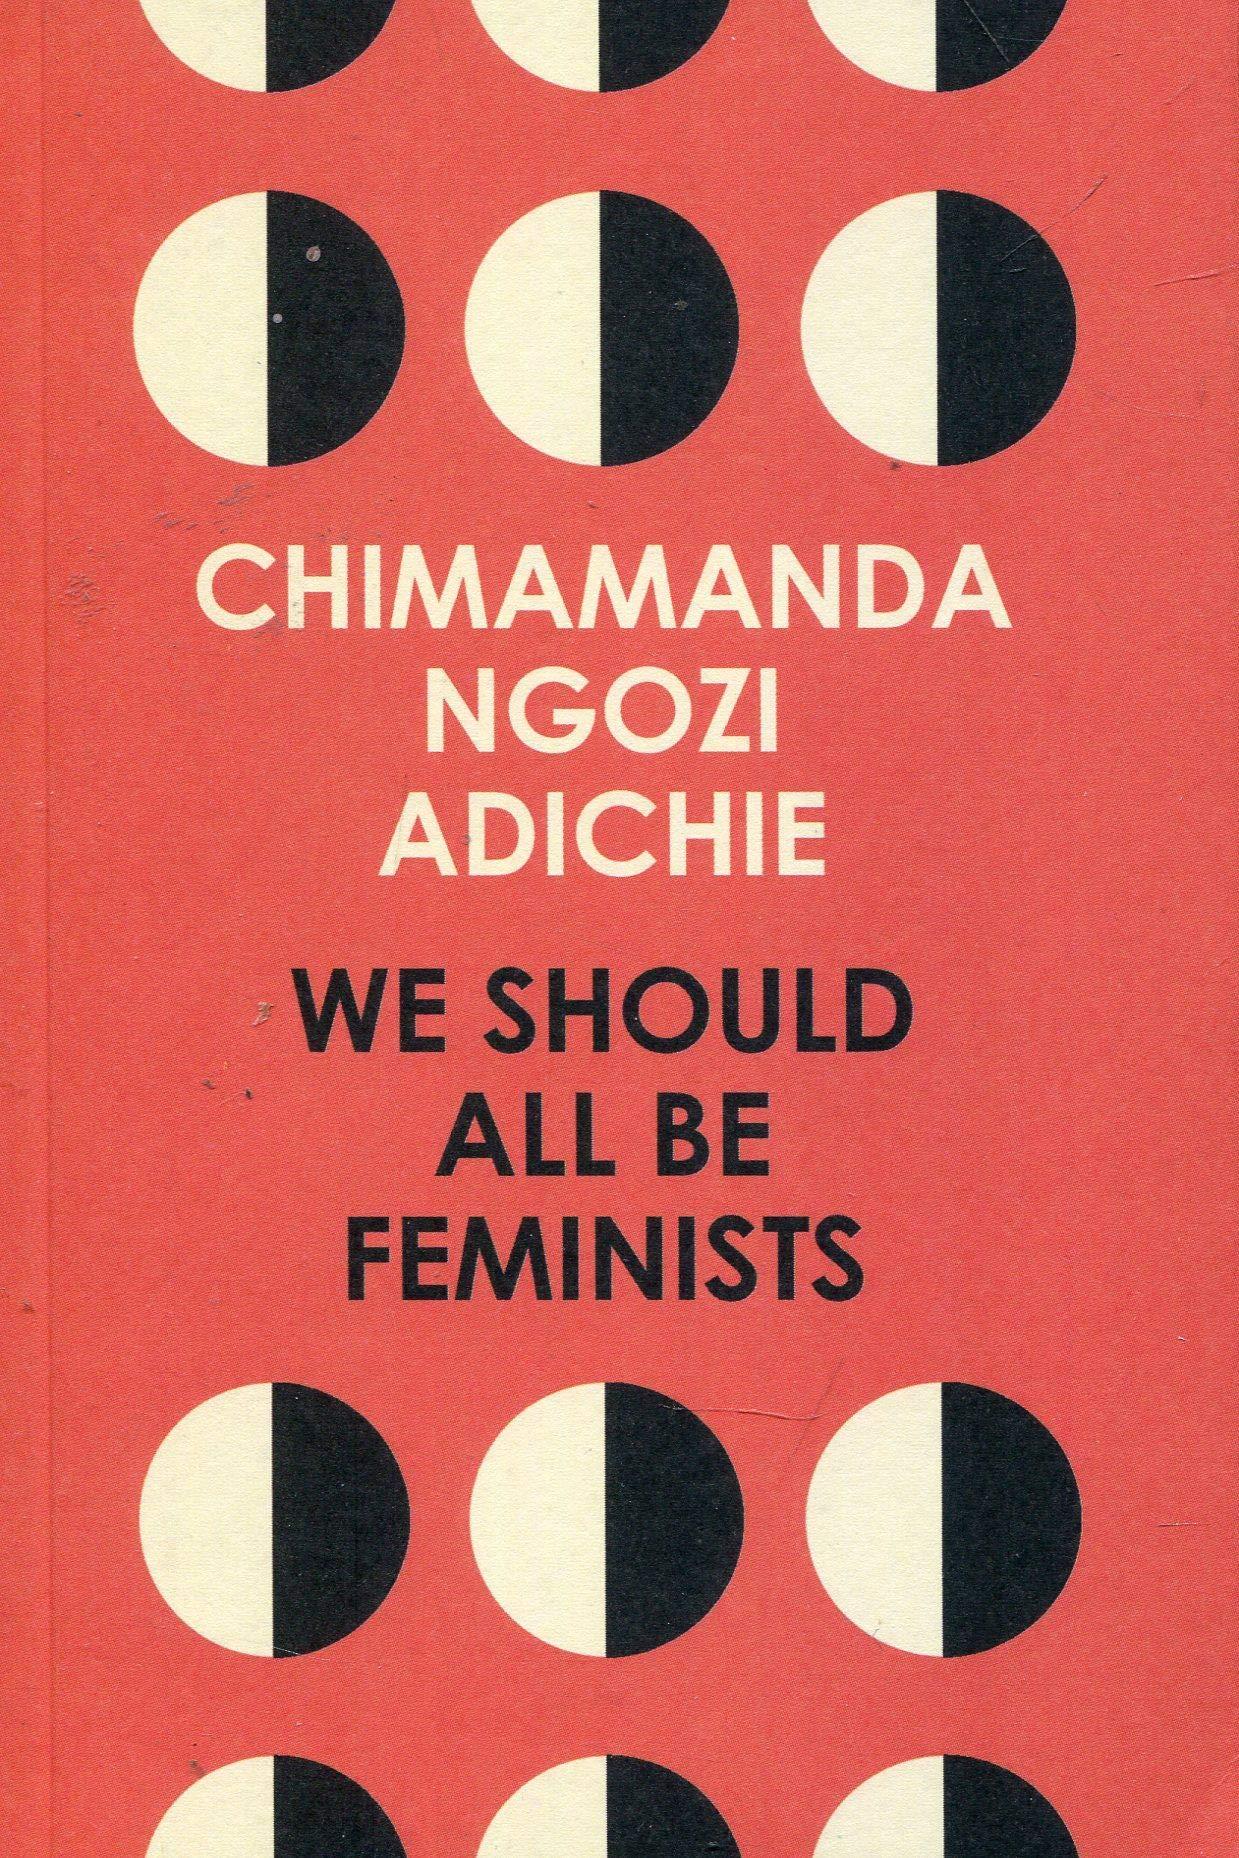 We Should All Be Feminists – di Ngozi Adichie, Chimamanda